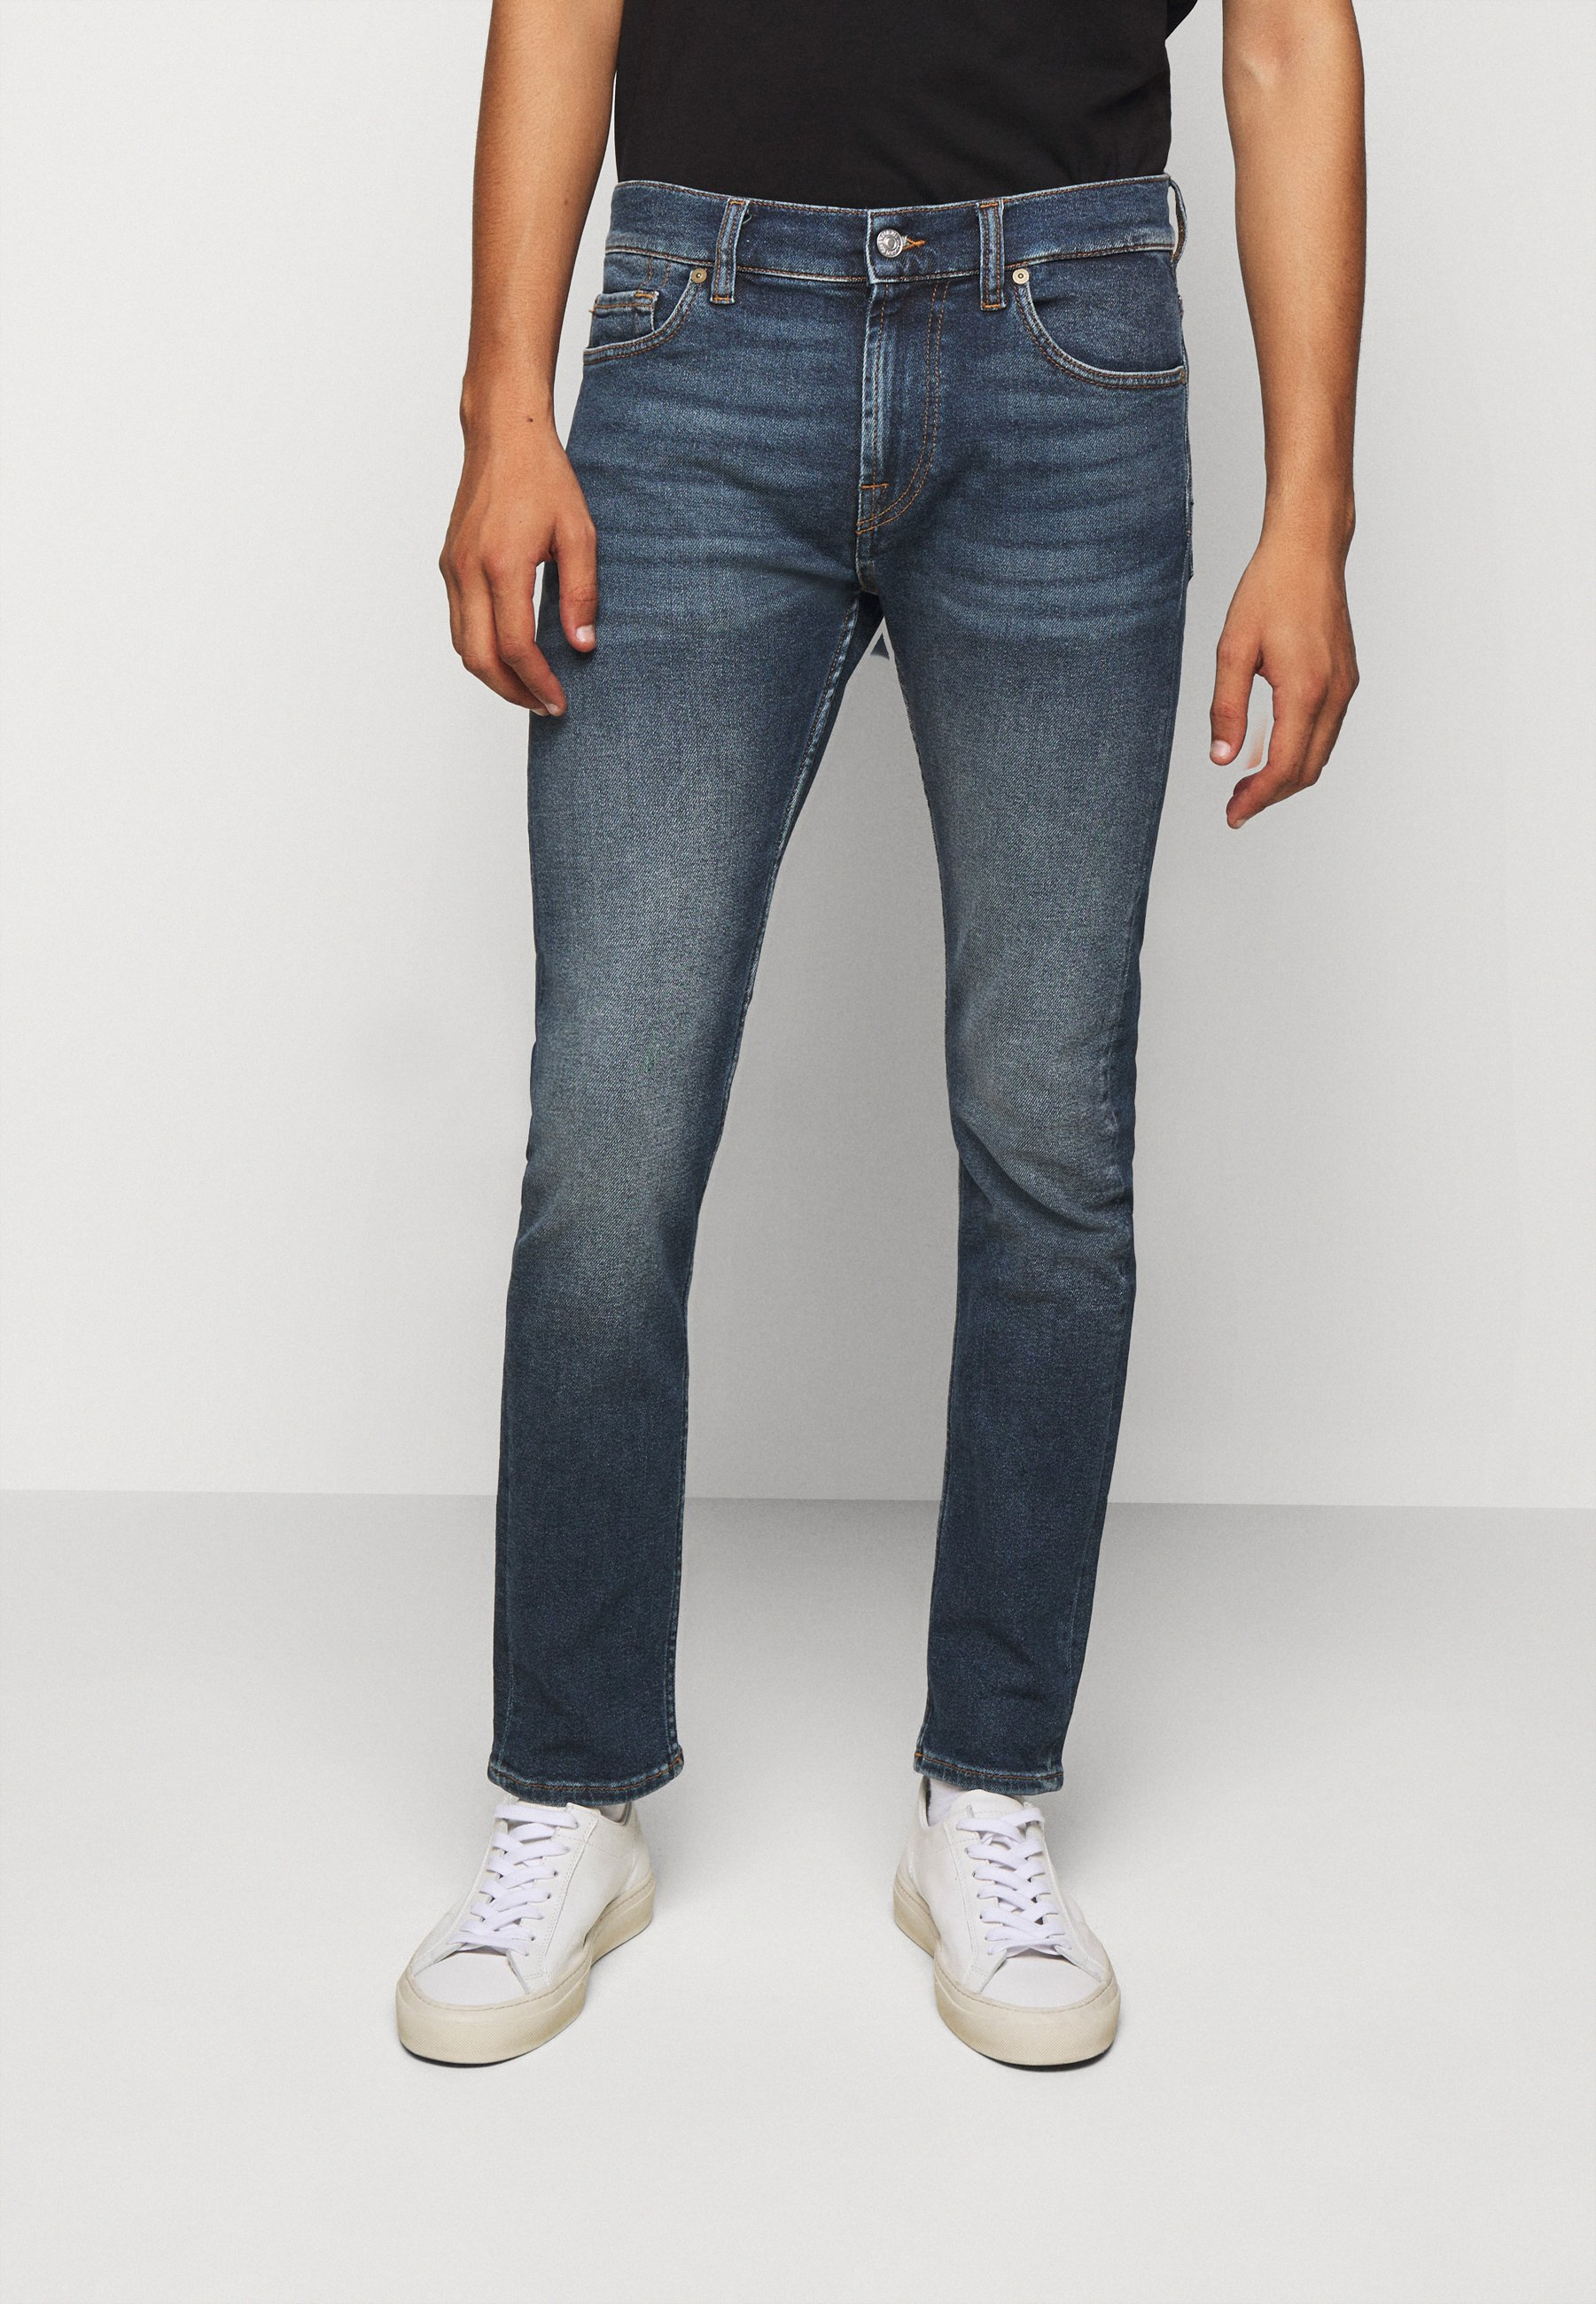 Uomo RONNIE LUXVINDEFBLU - Jeans slim fit